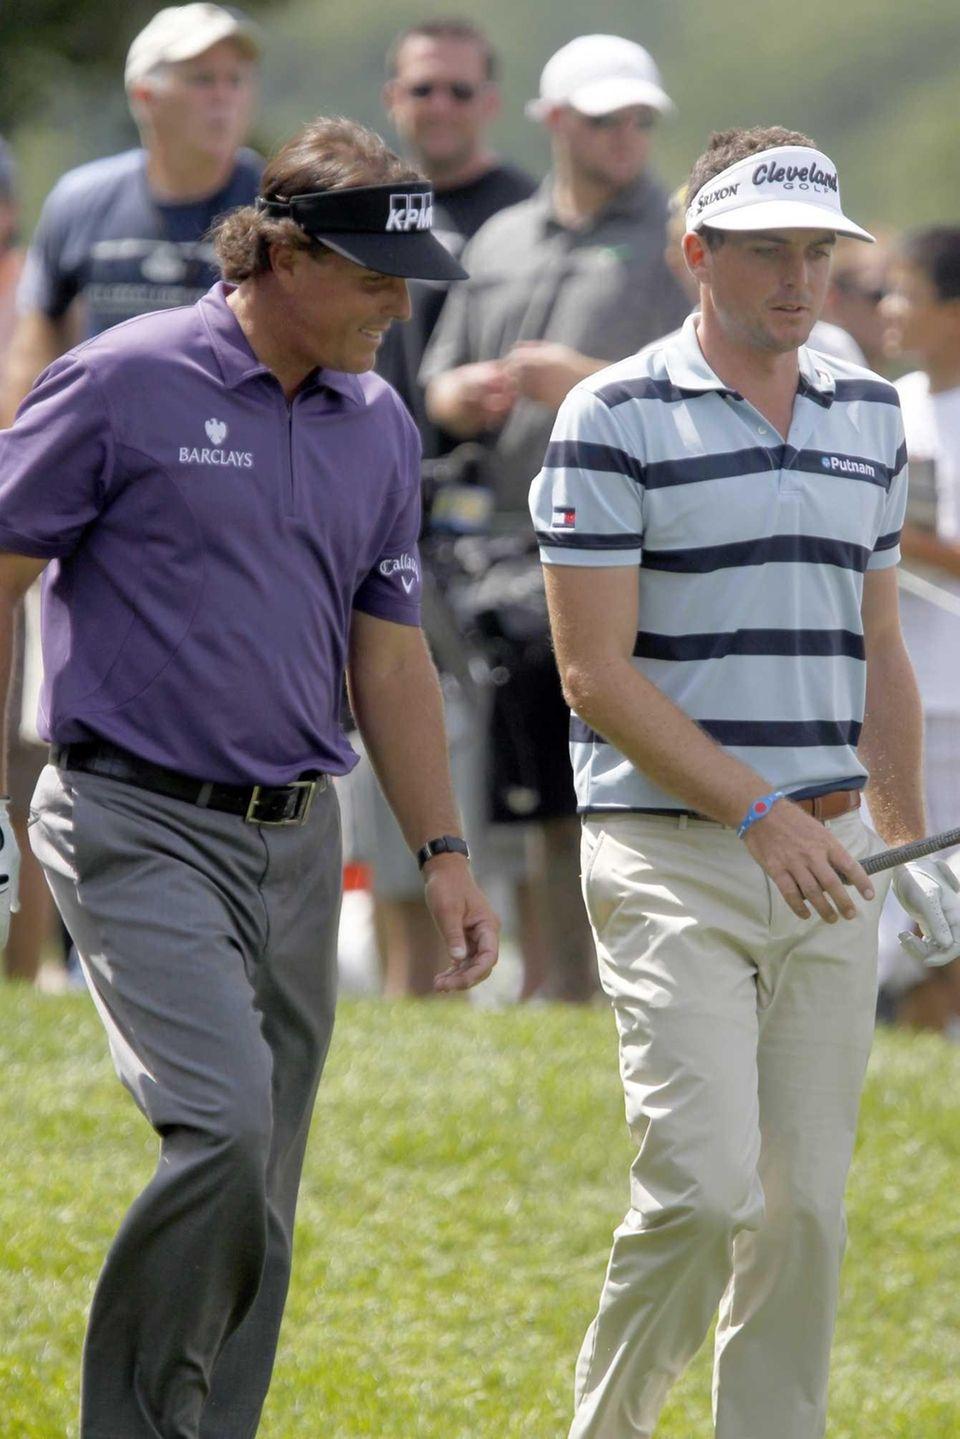 Phil Mickelson and Keegan Bradley walk and talk